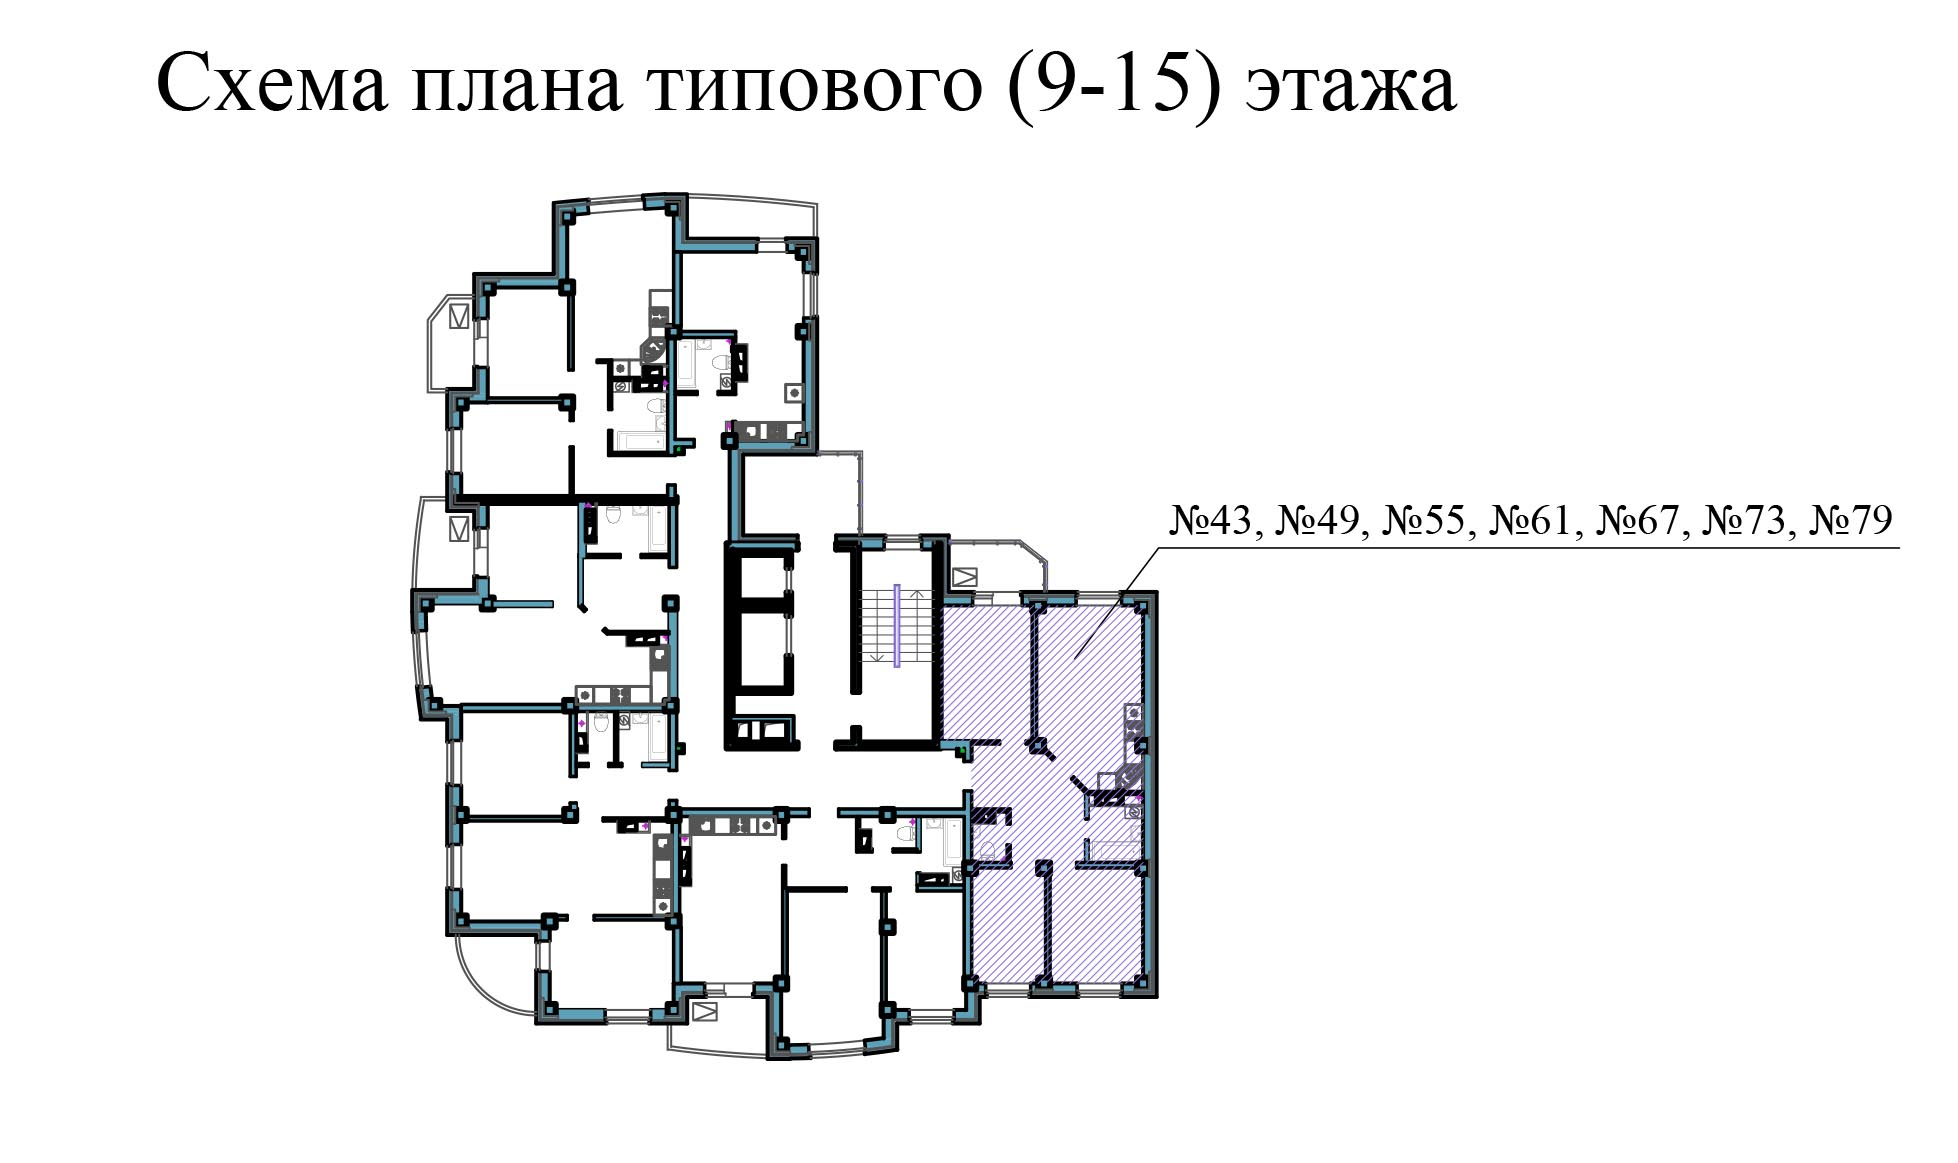 Трехкомнатная квартира- ул.Балтийская, д. 1а, кв. 43,49,55,61,67,73